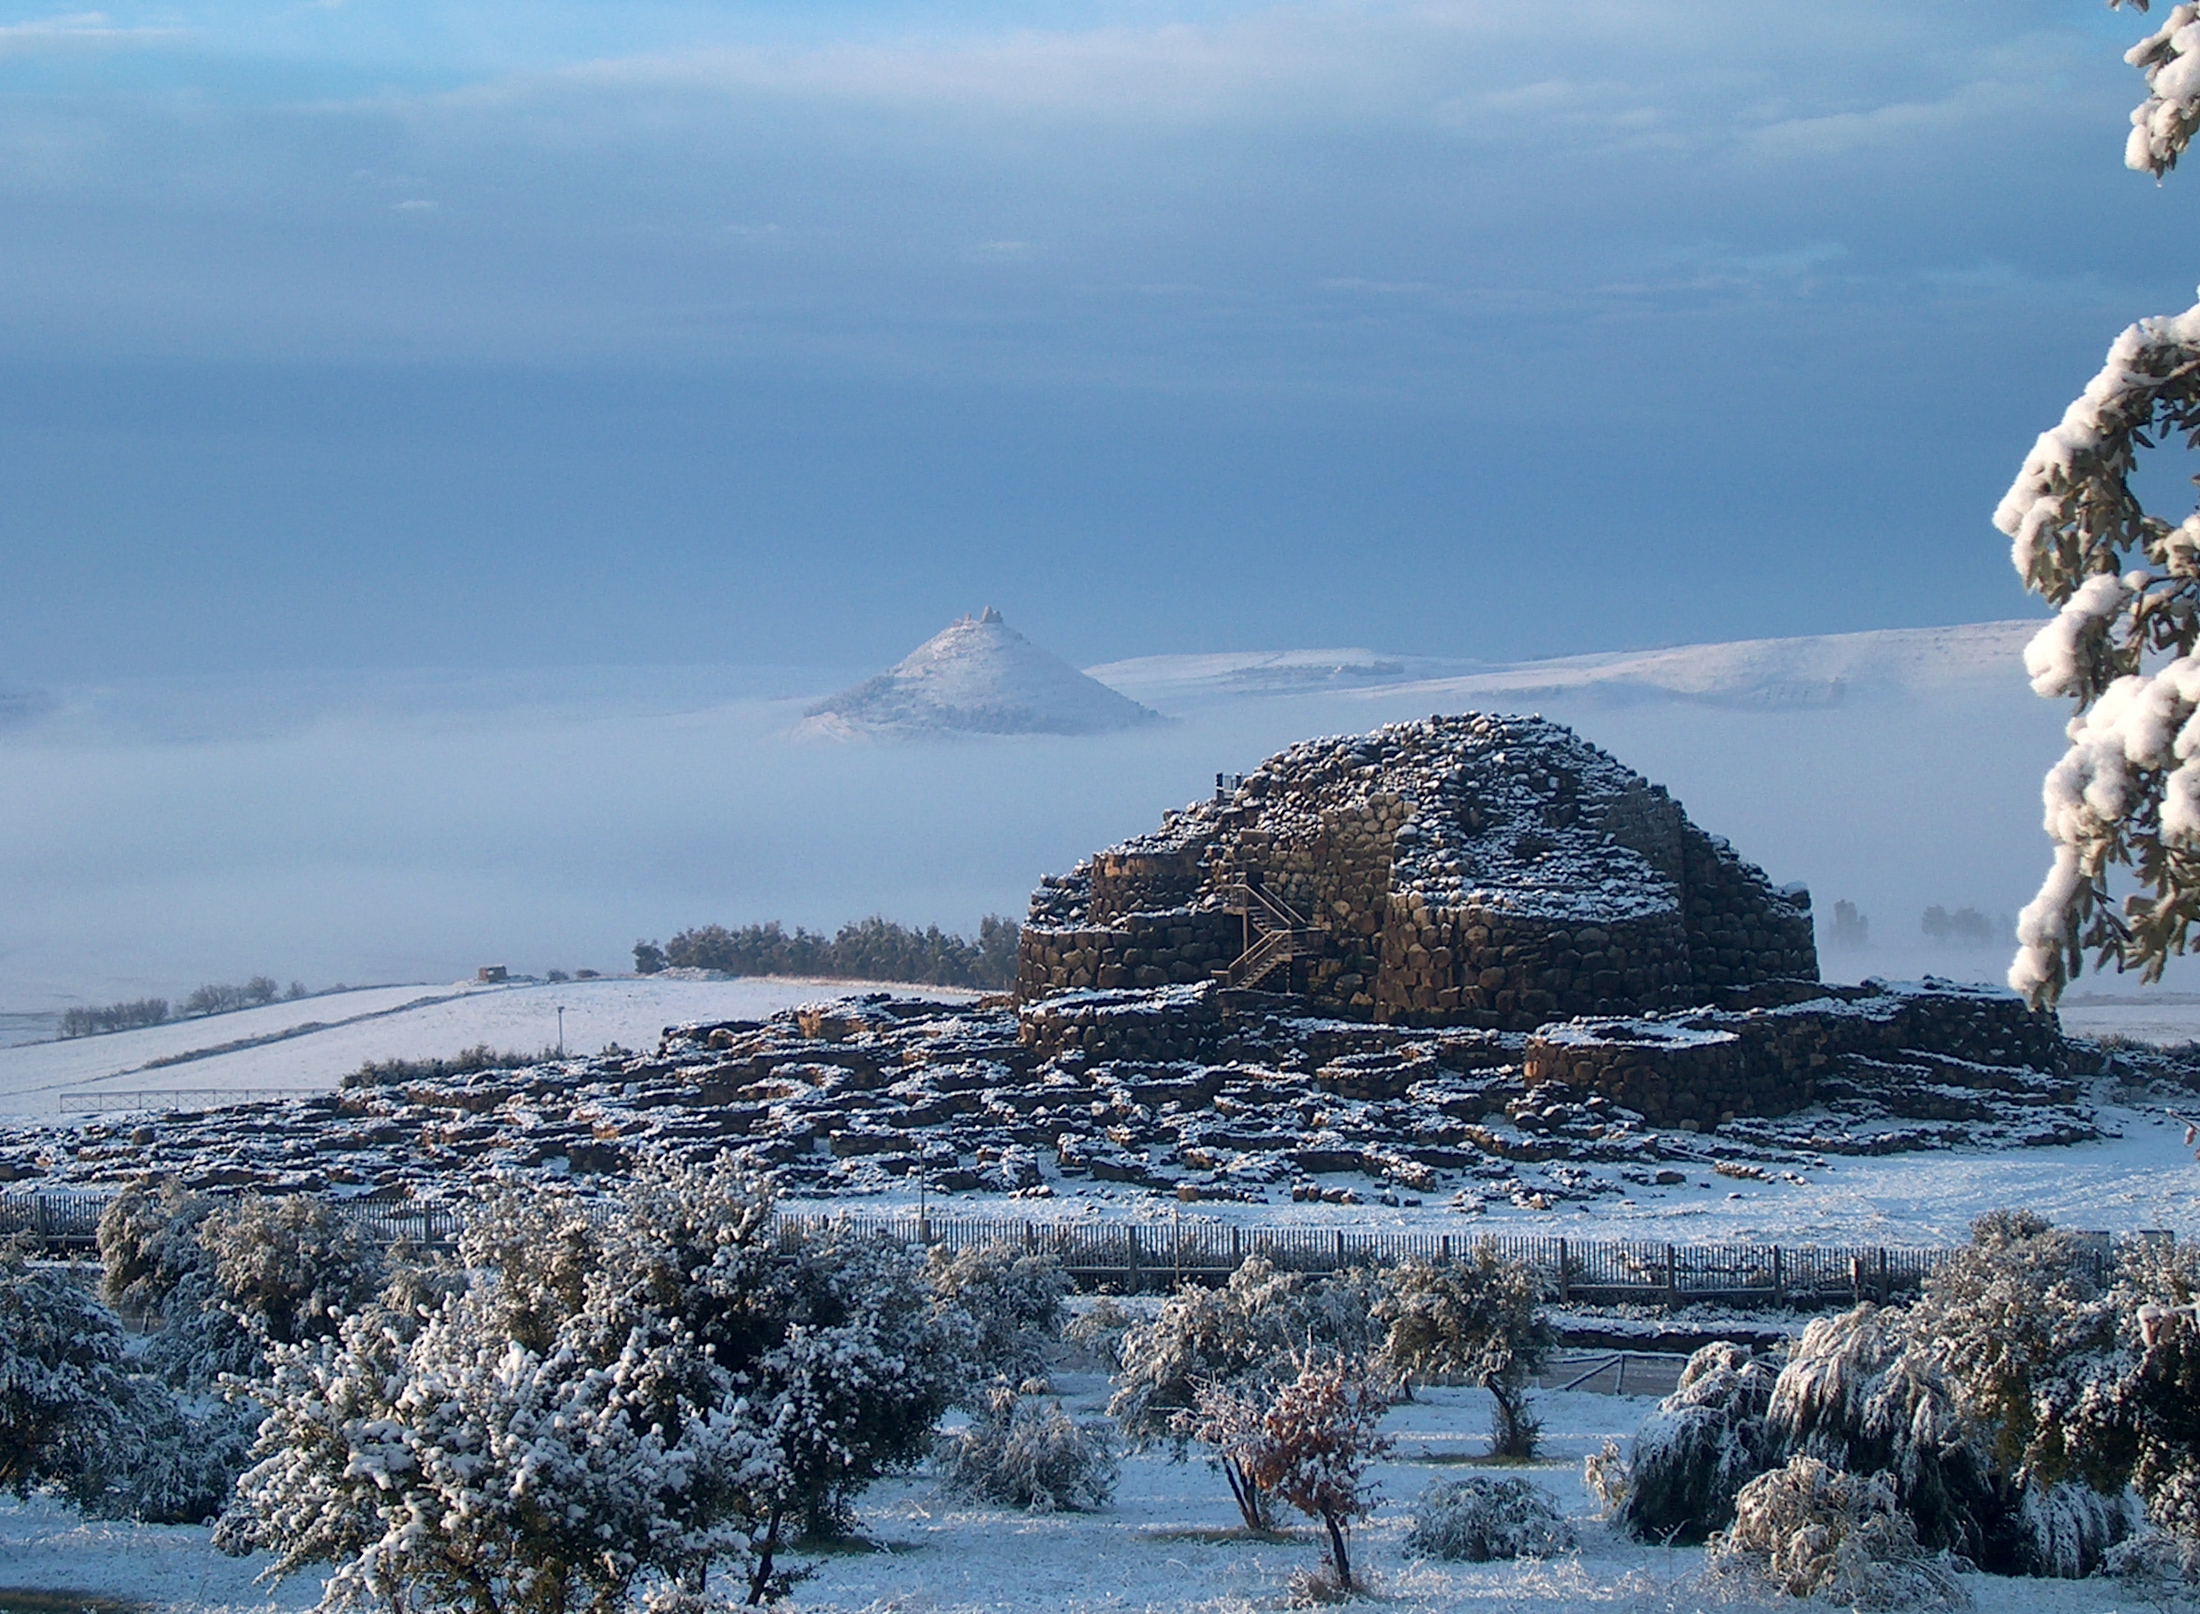 Su Nuraxi di Barumini in winter